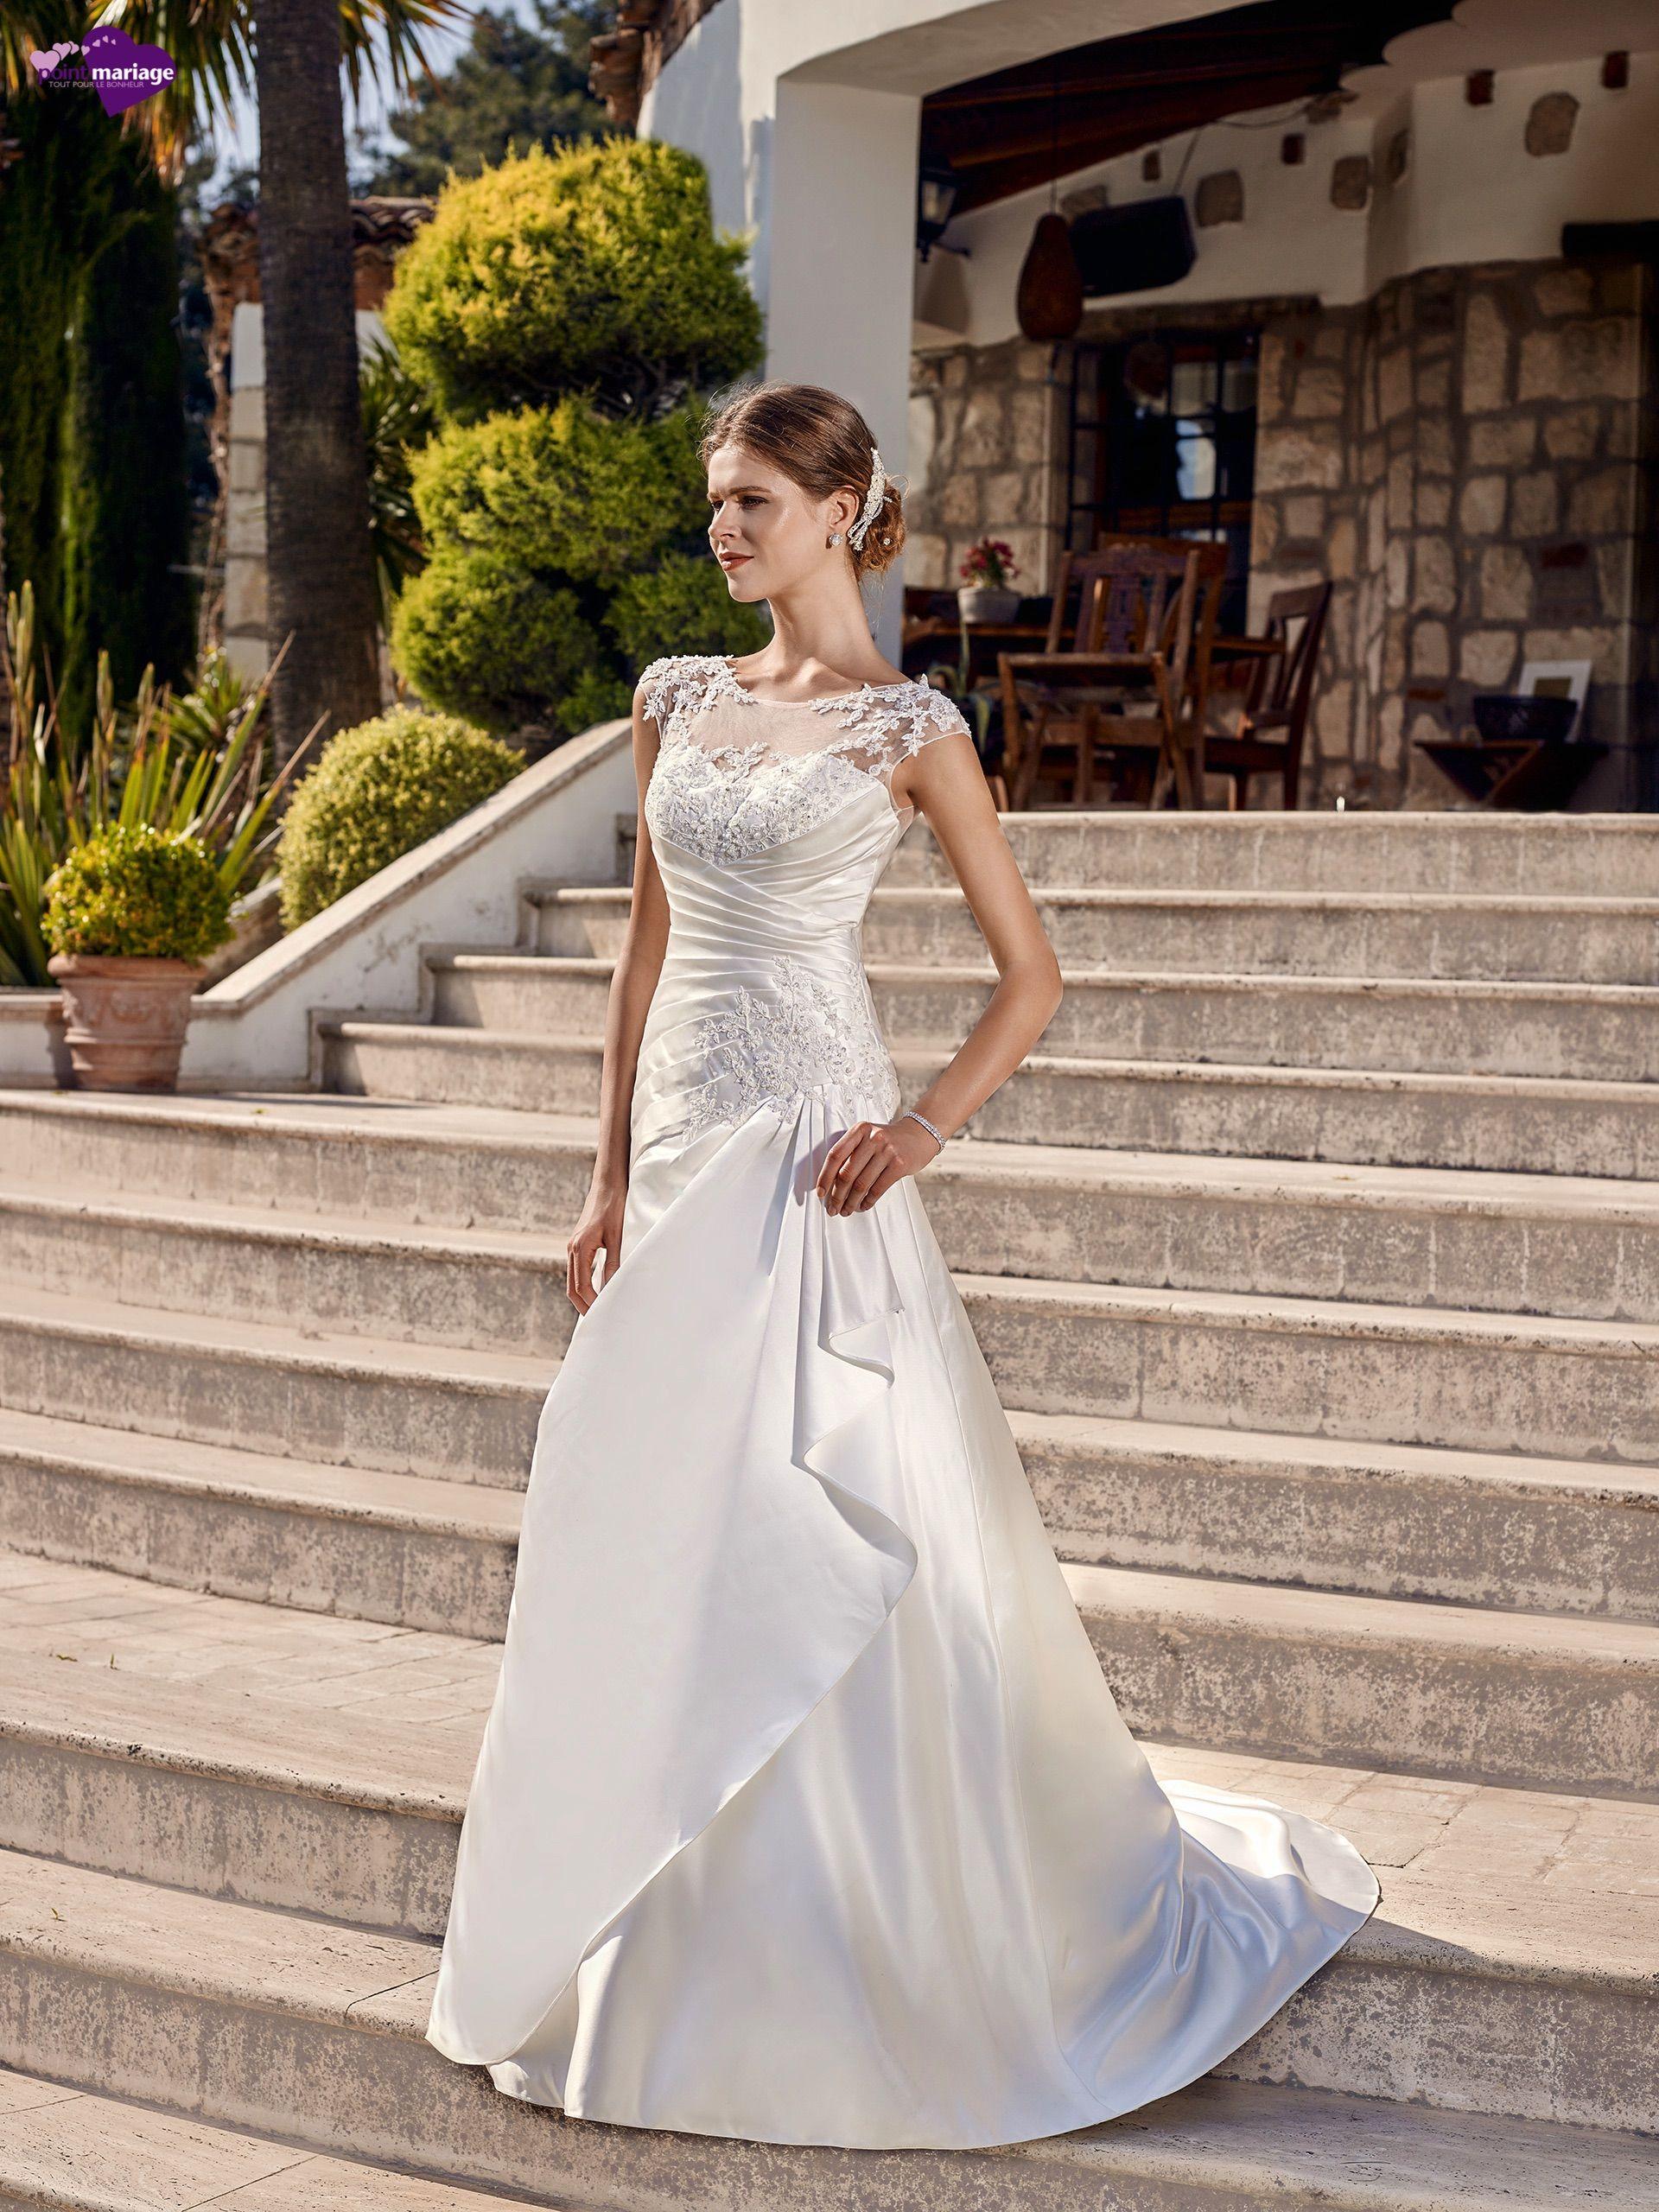 Robe mariage civil annecy